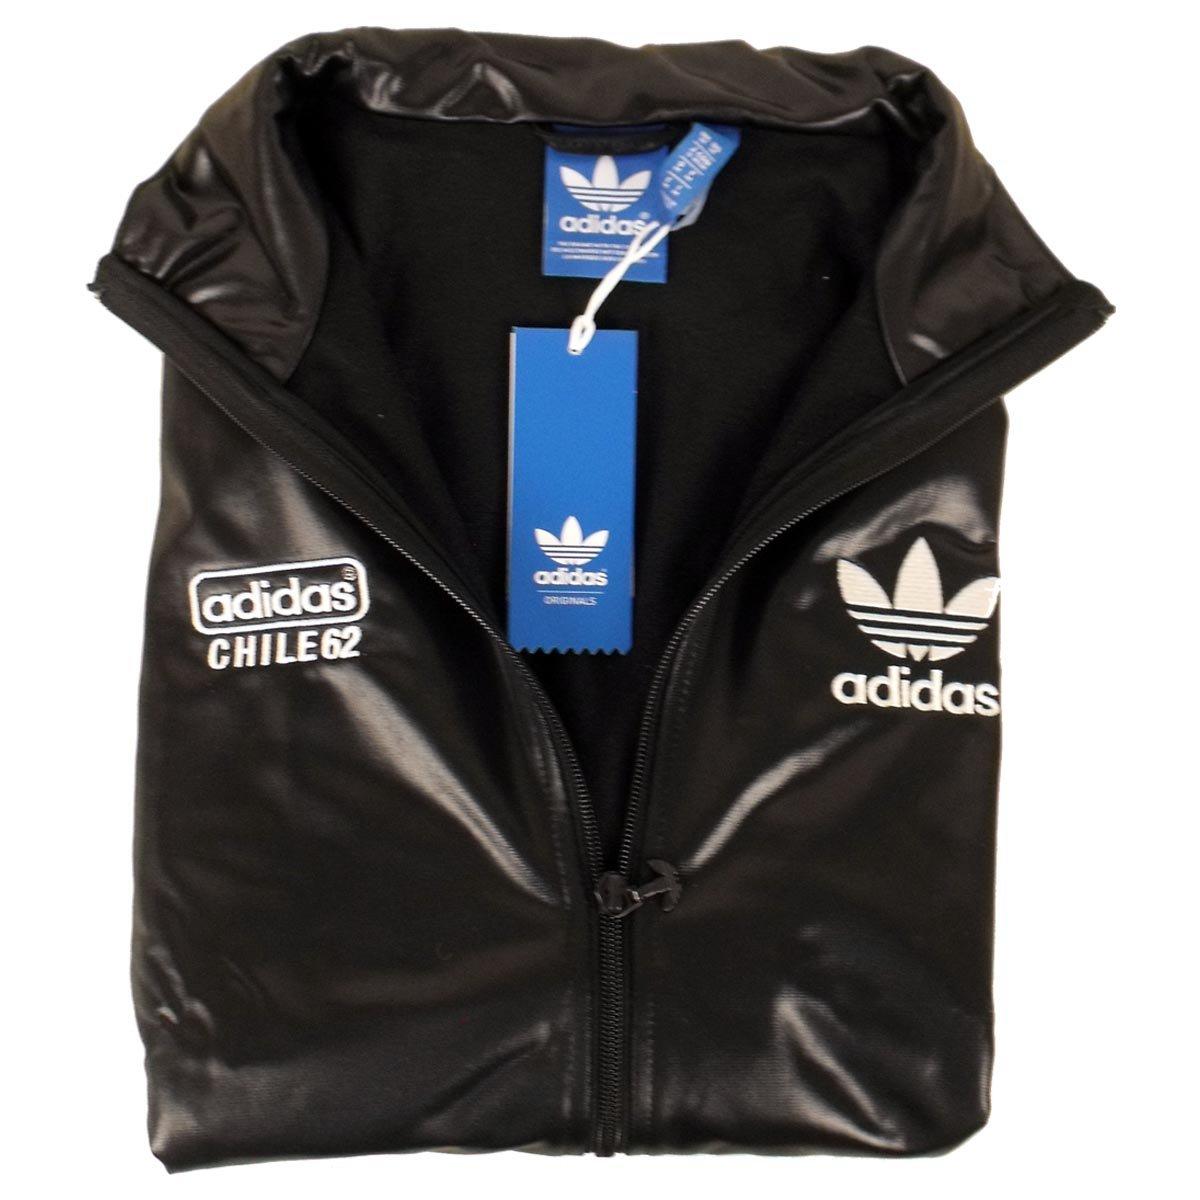 Di Uomo Adidas Giacca Chile Nera Look Tuta 62 Da Tt Originals wHBY41